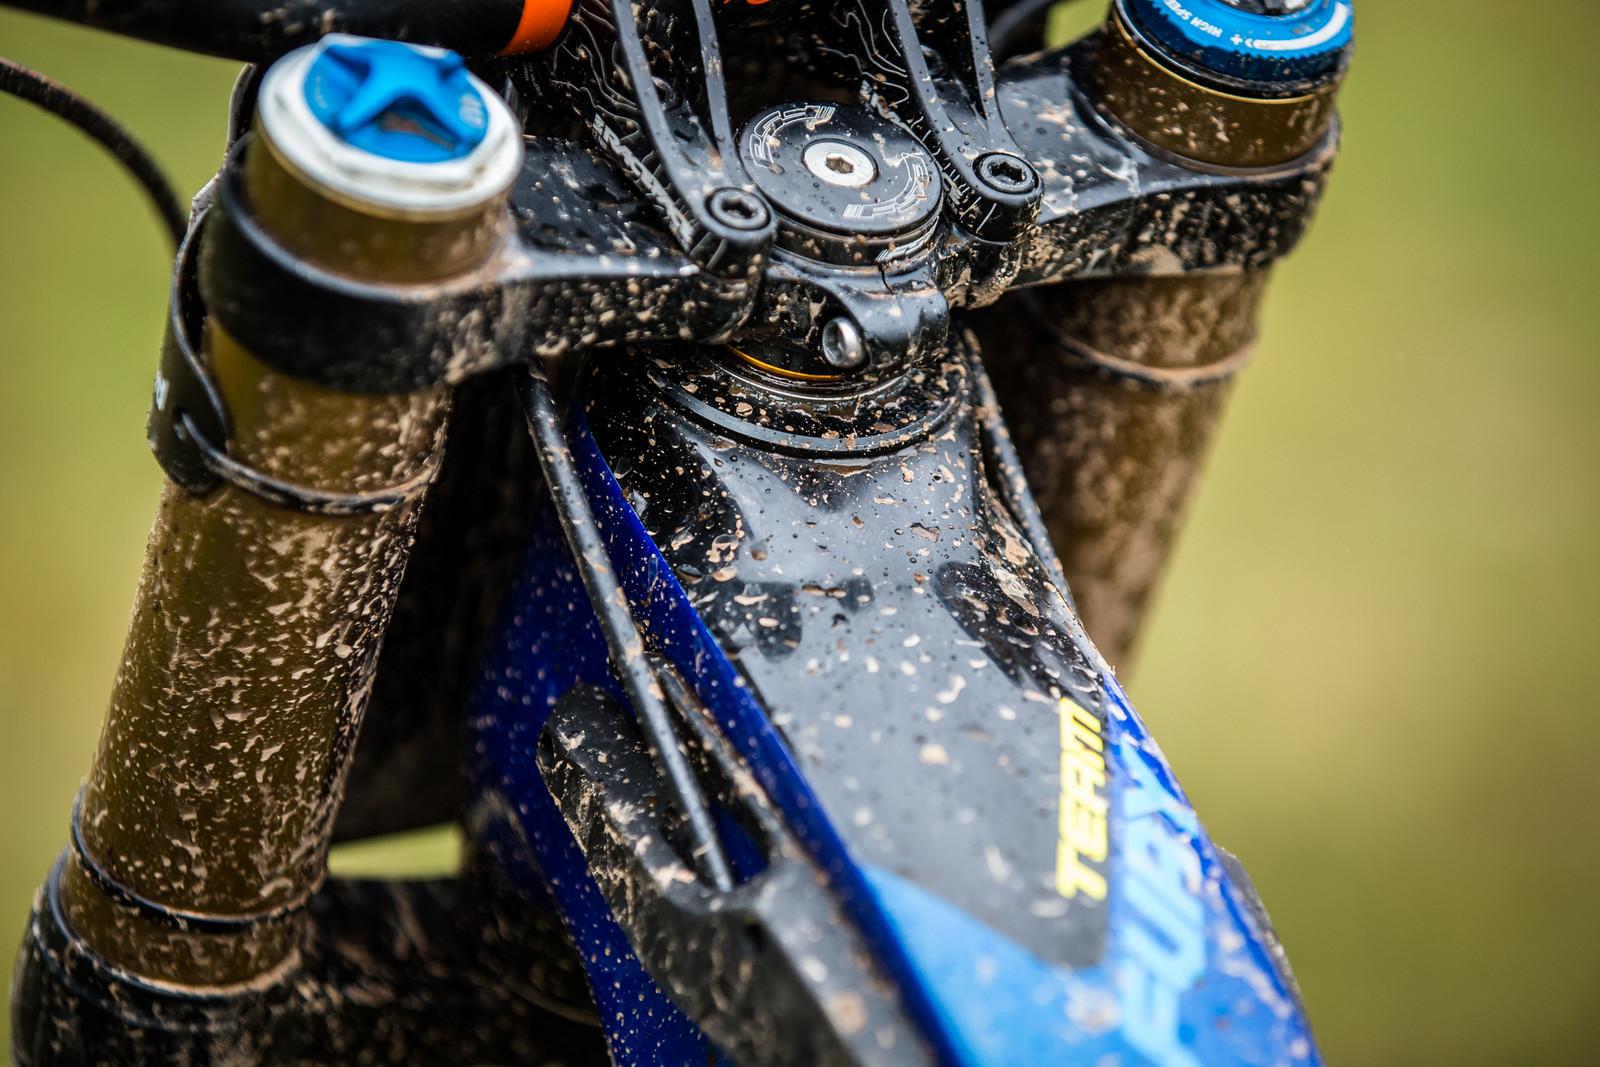 Adjustable Headset / Headtube Cup - WINNING BIKE - Martin Maes' GT Fury - Mountain Biking Pictures - Vital MTB